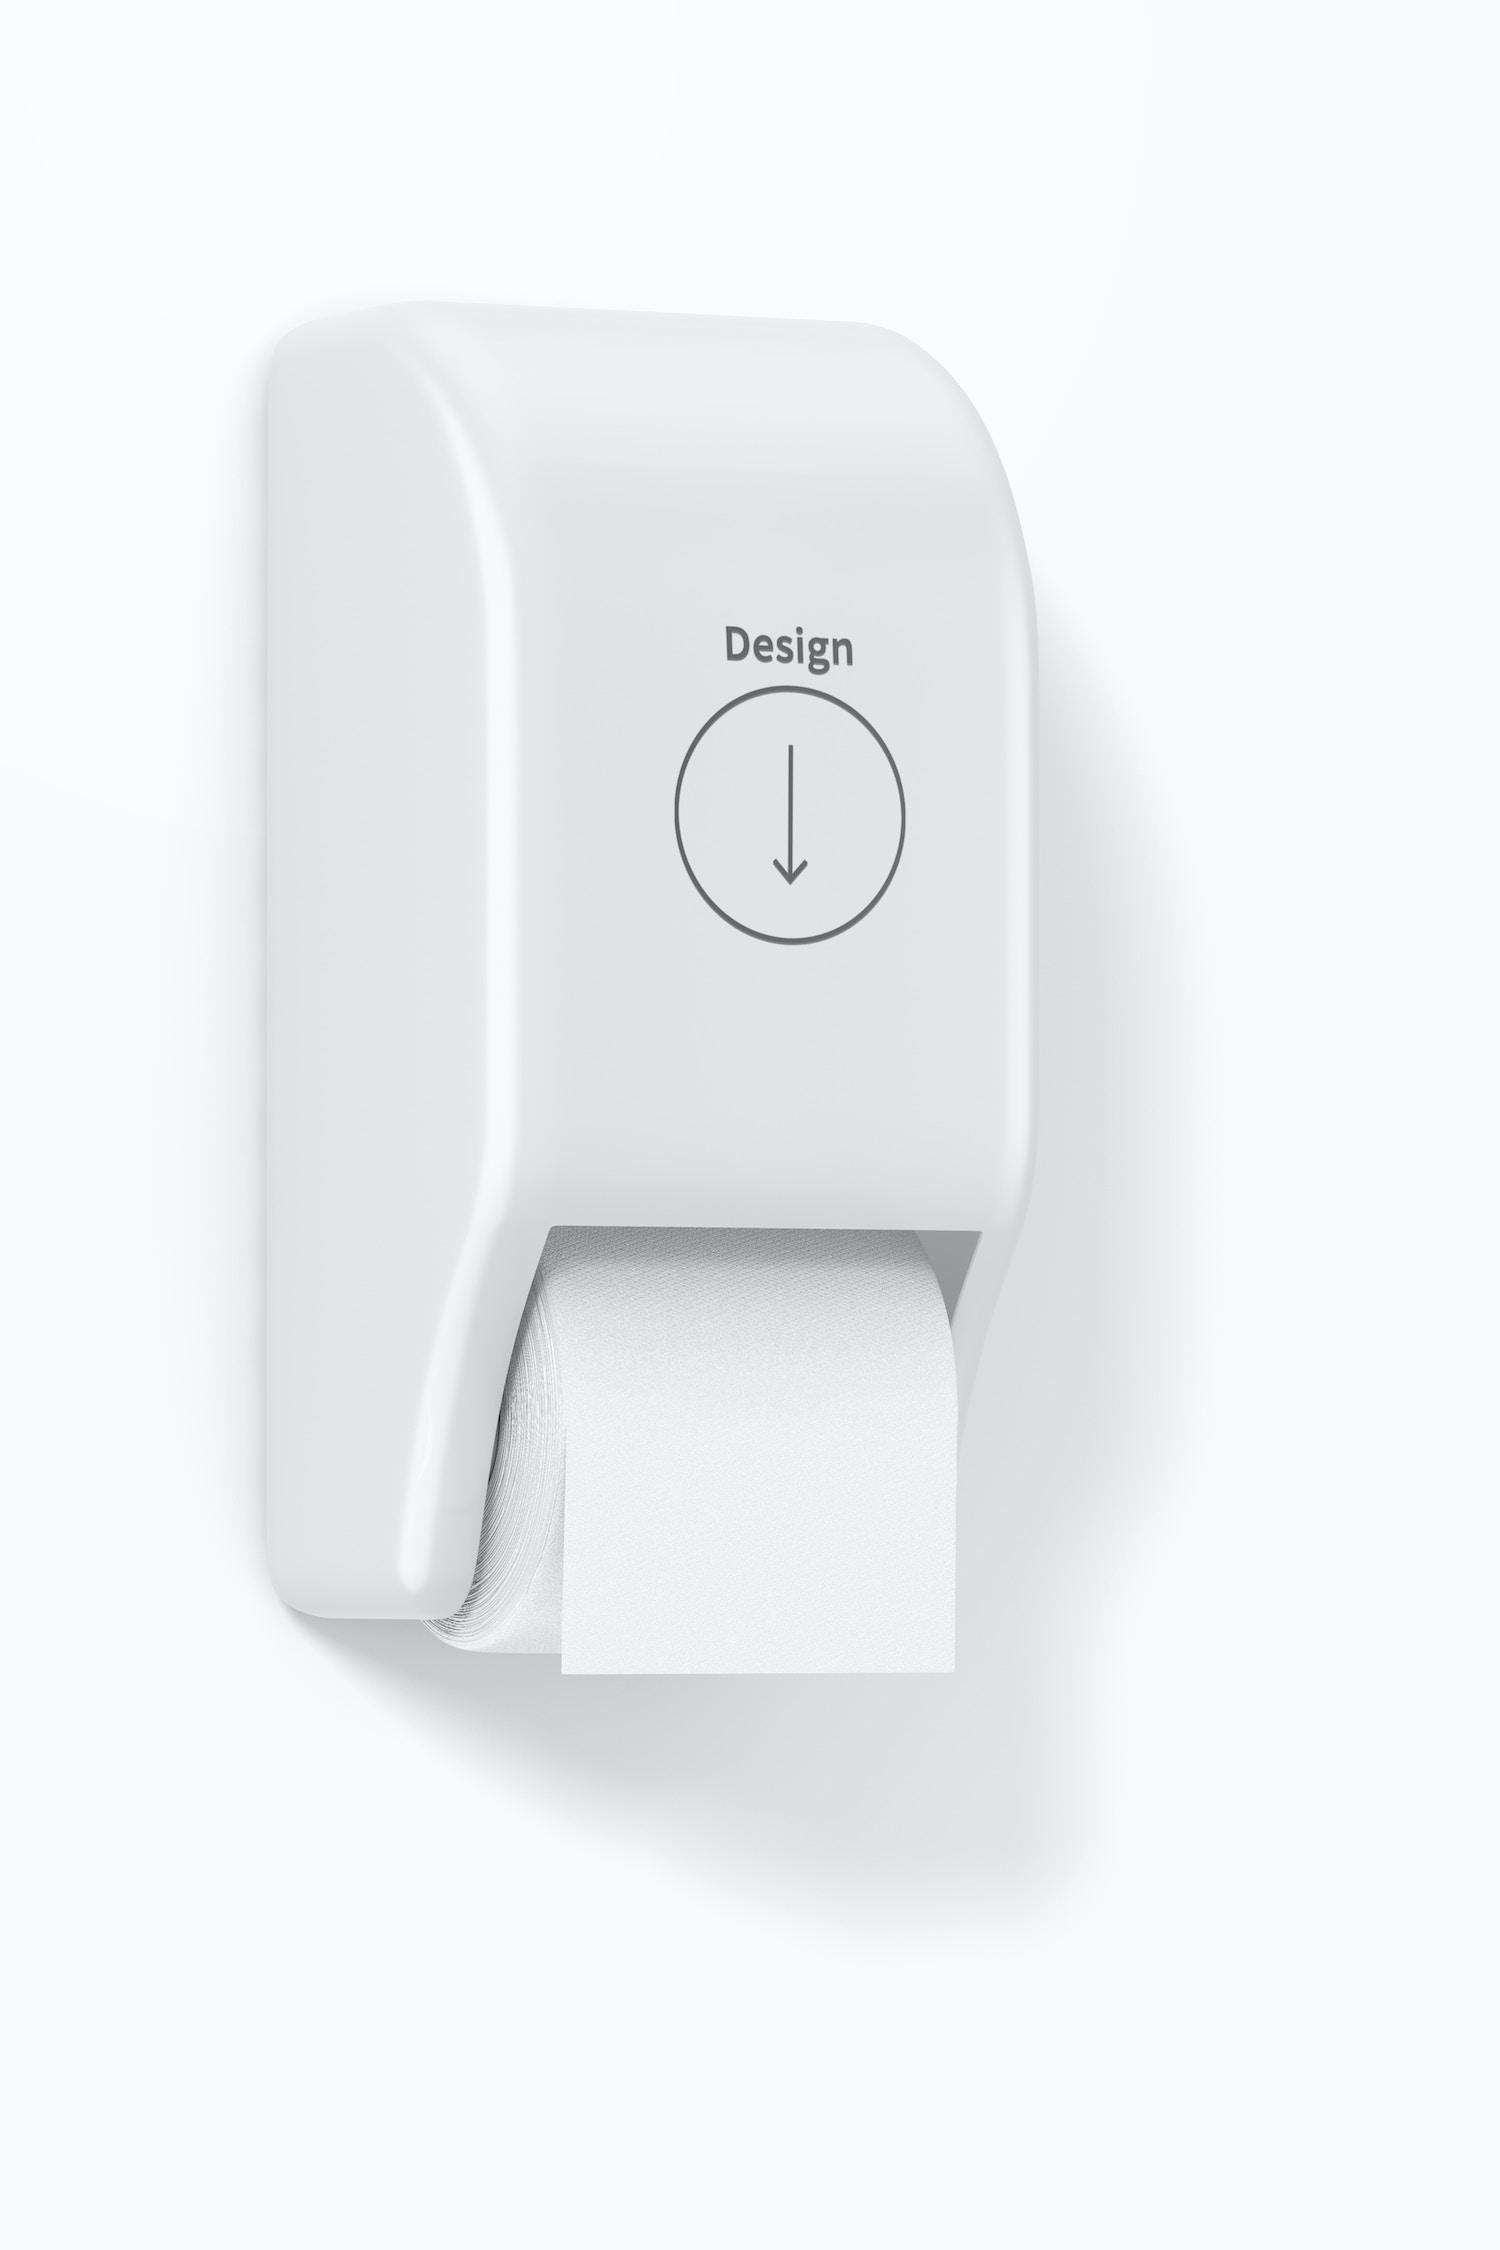 Toilet Paper Holder Mockup